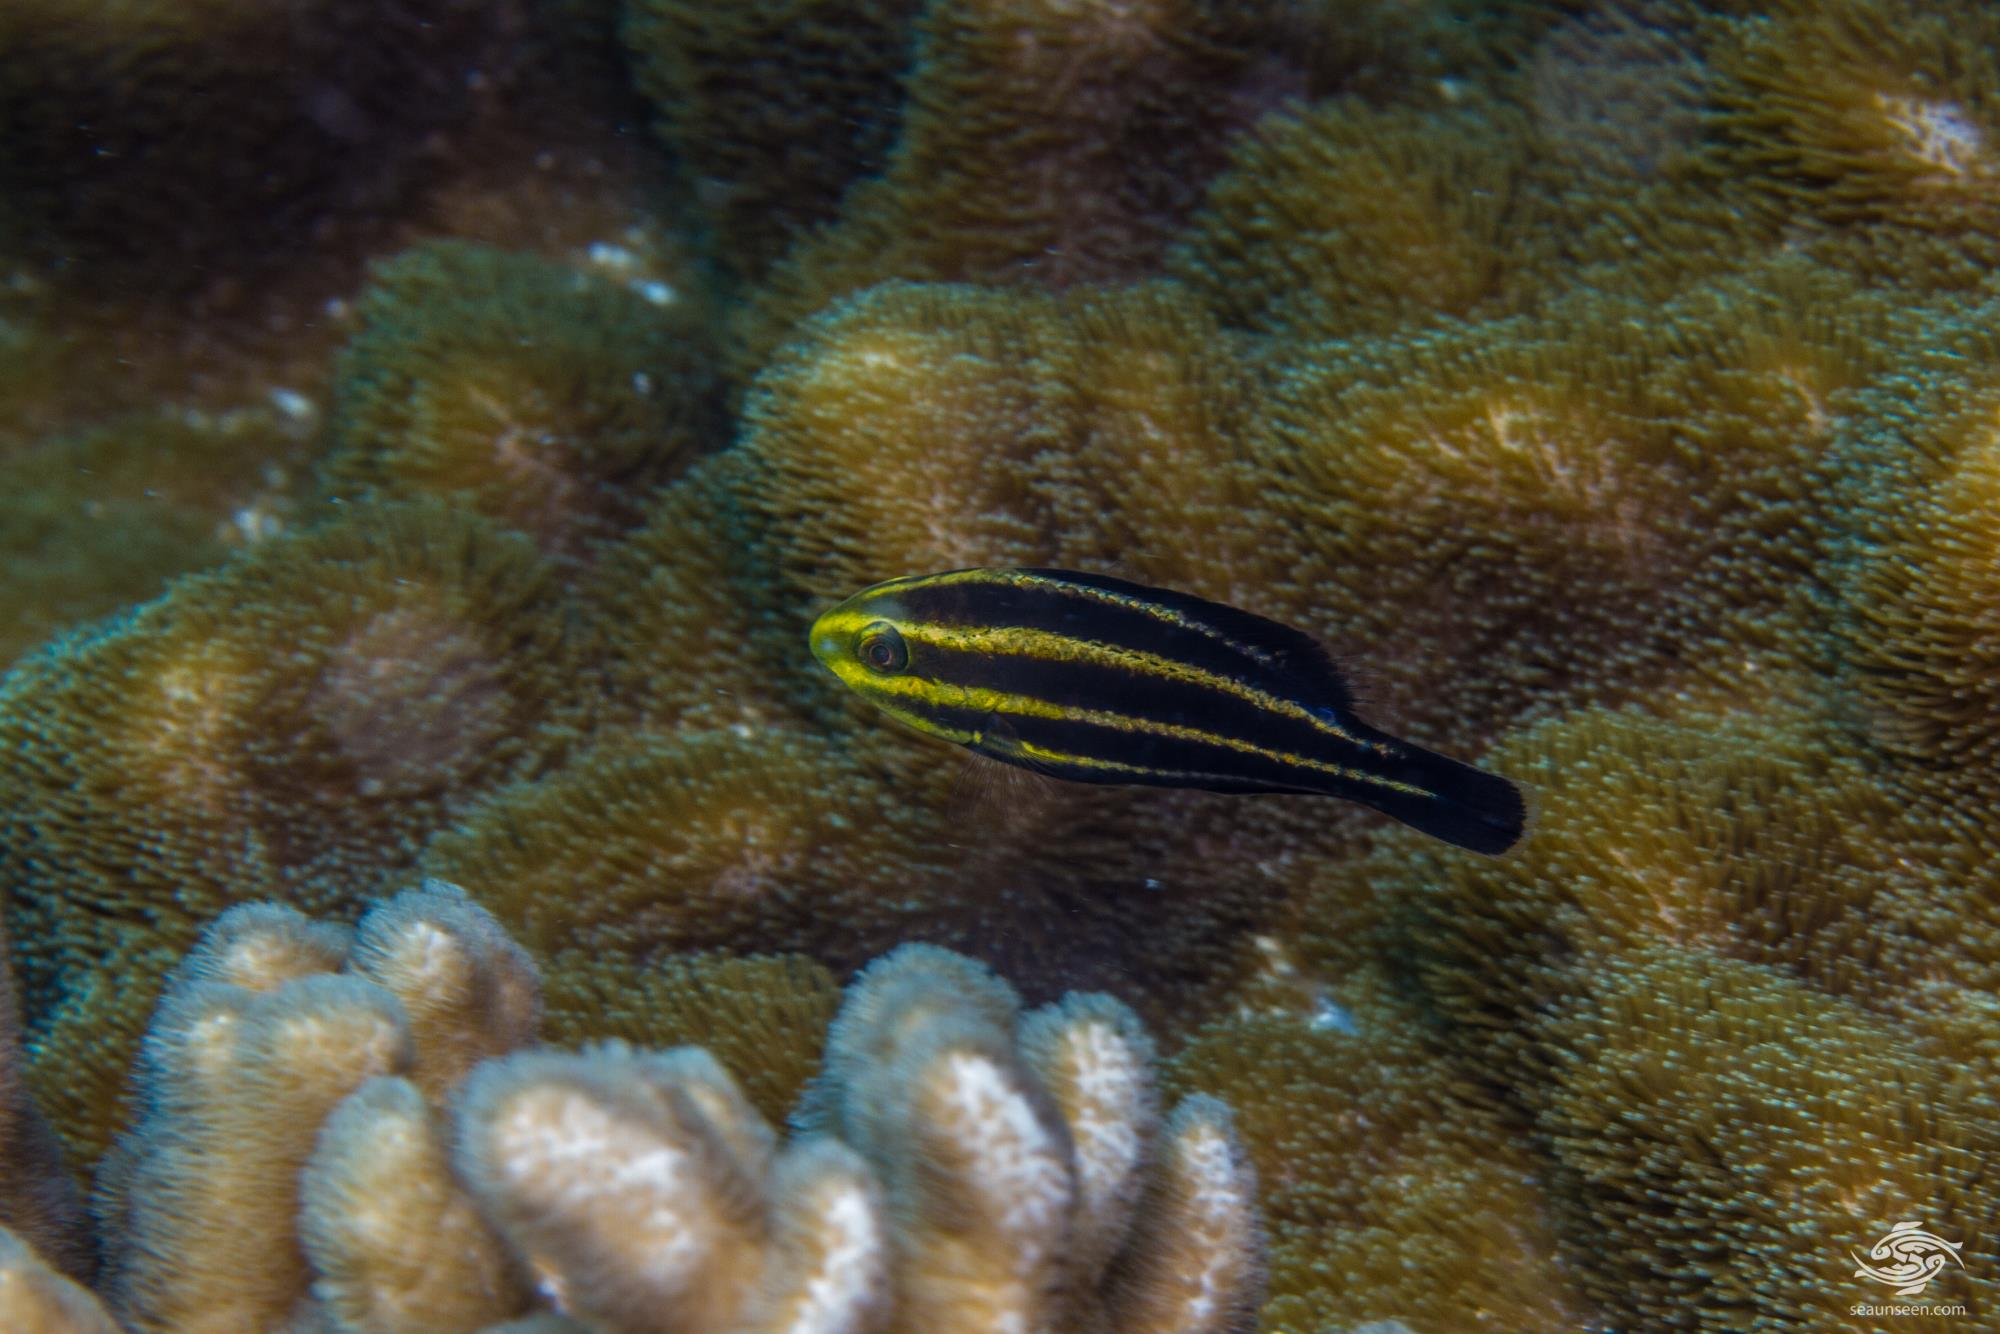 Juvenile Steephead parrotfish (Chlorurus strongylocephalus) also known as the Roundhead Parrotfish